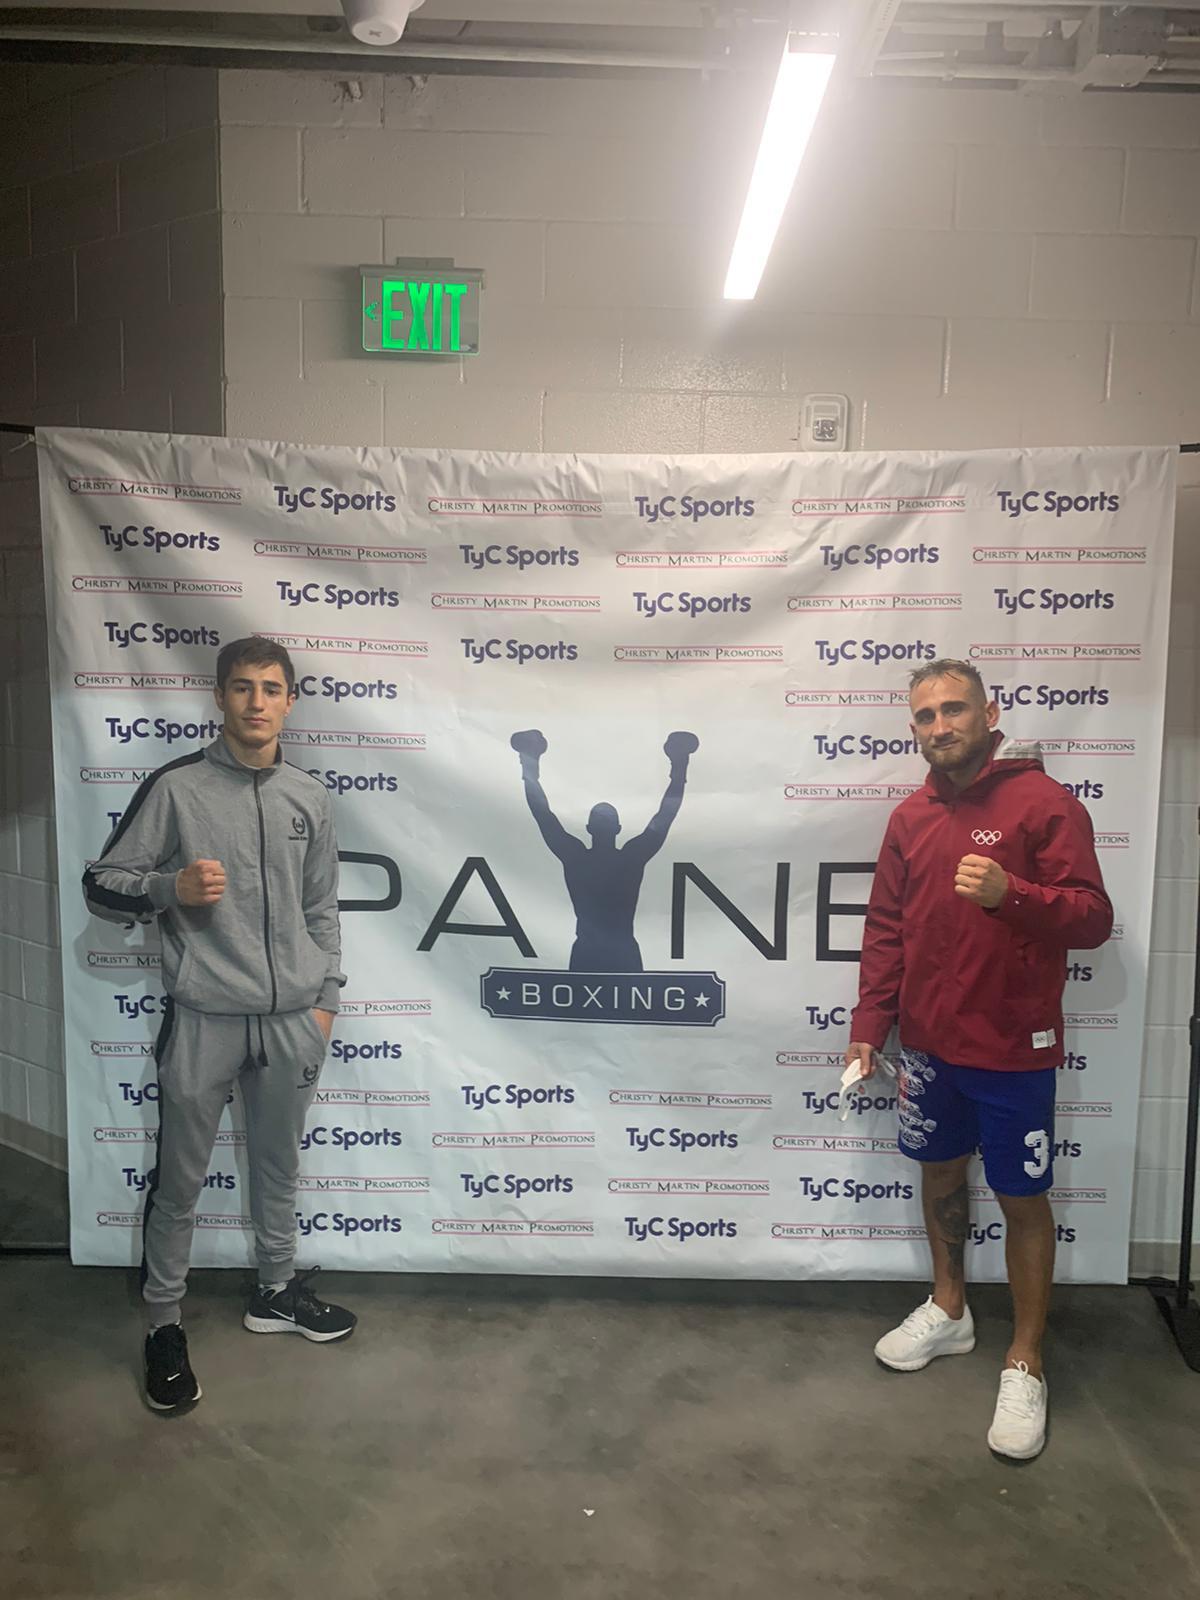 Palmetta defeated Corral in South Carolina